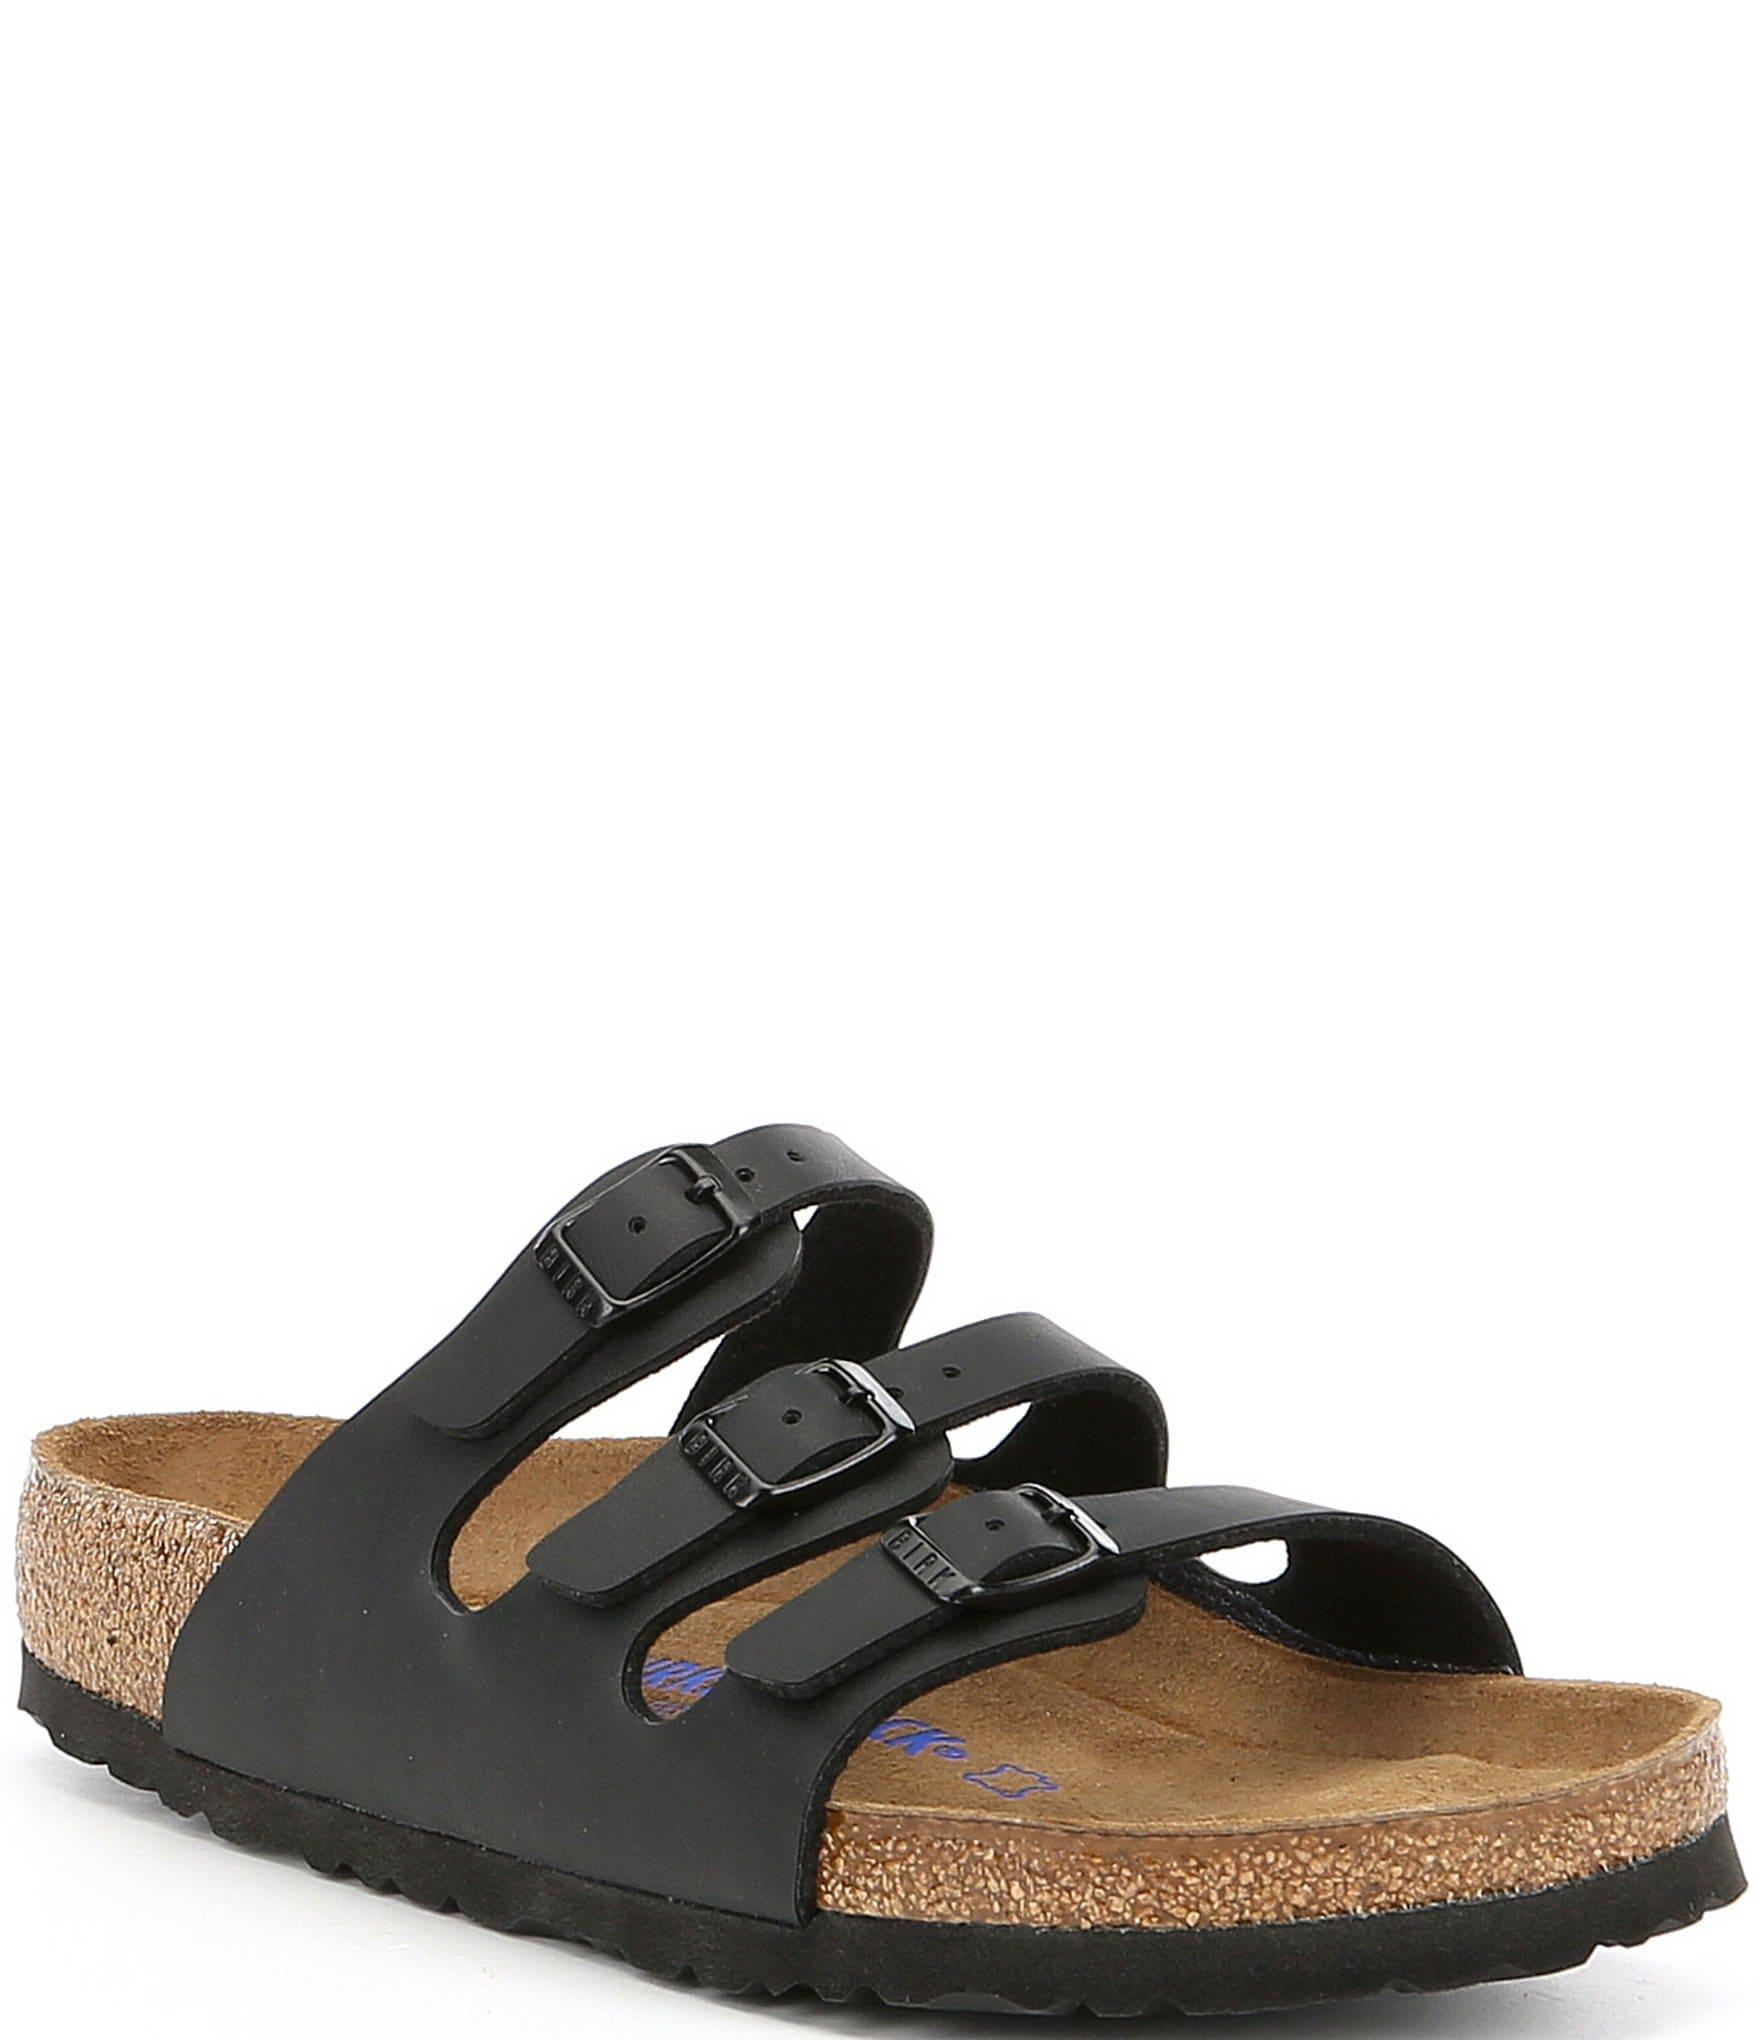 Florida Footbed Florida Footbed Florida Birkenstock Sandals Soft Sandals Soft Birkenstock Birkenstock qA4cRS53jL